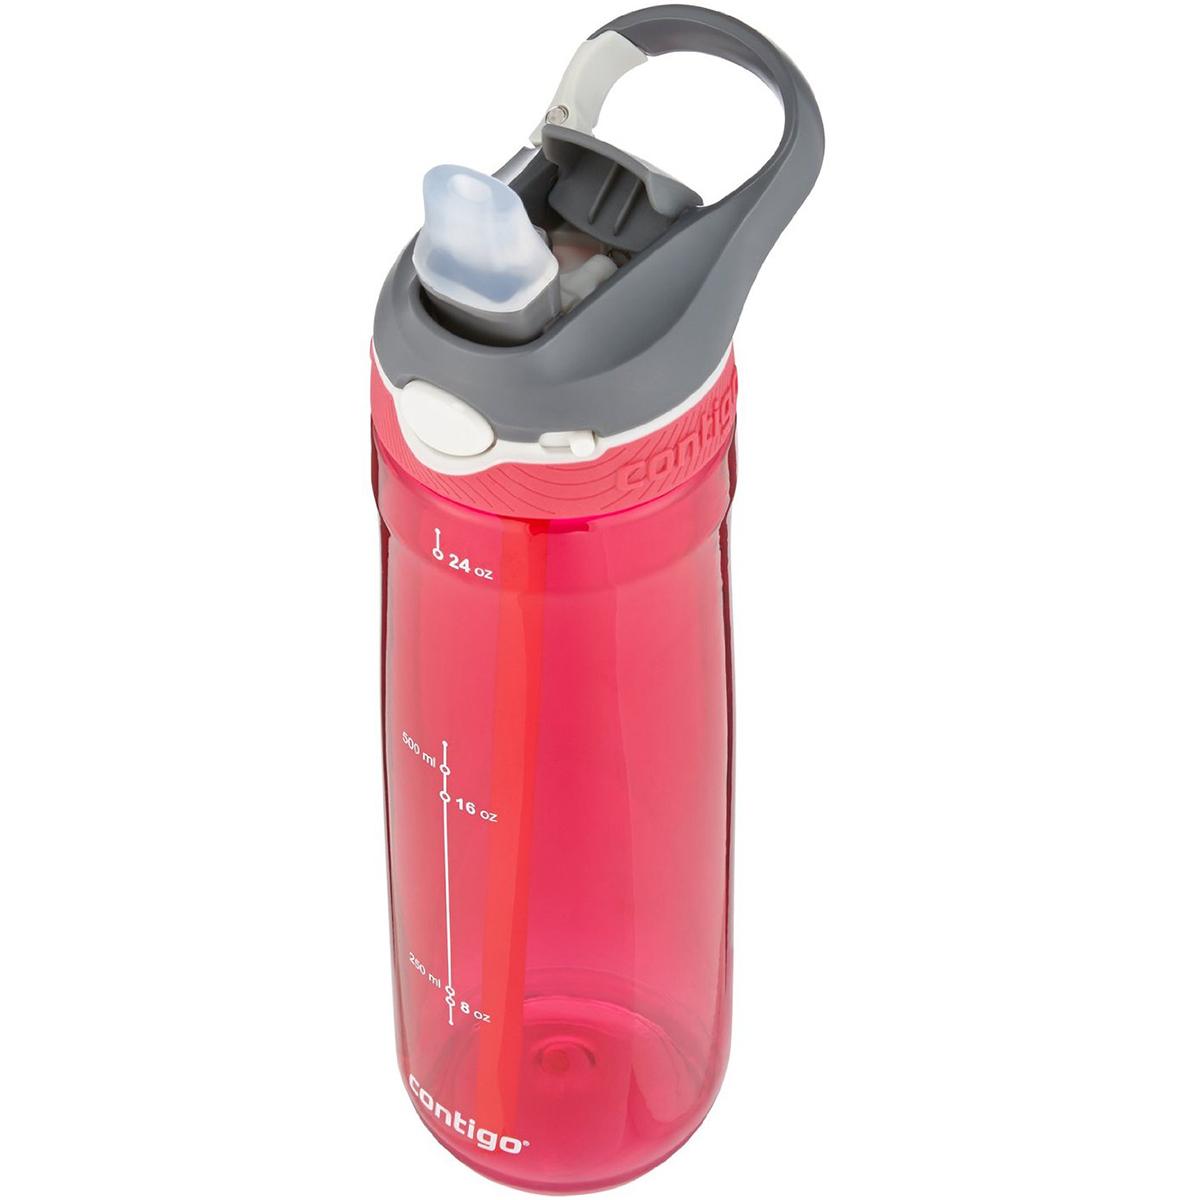 Contigo-24-oz-Ashland-Autospout-Water-Bottle miniatuur 25